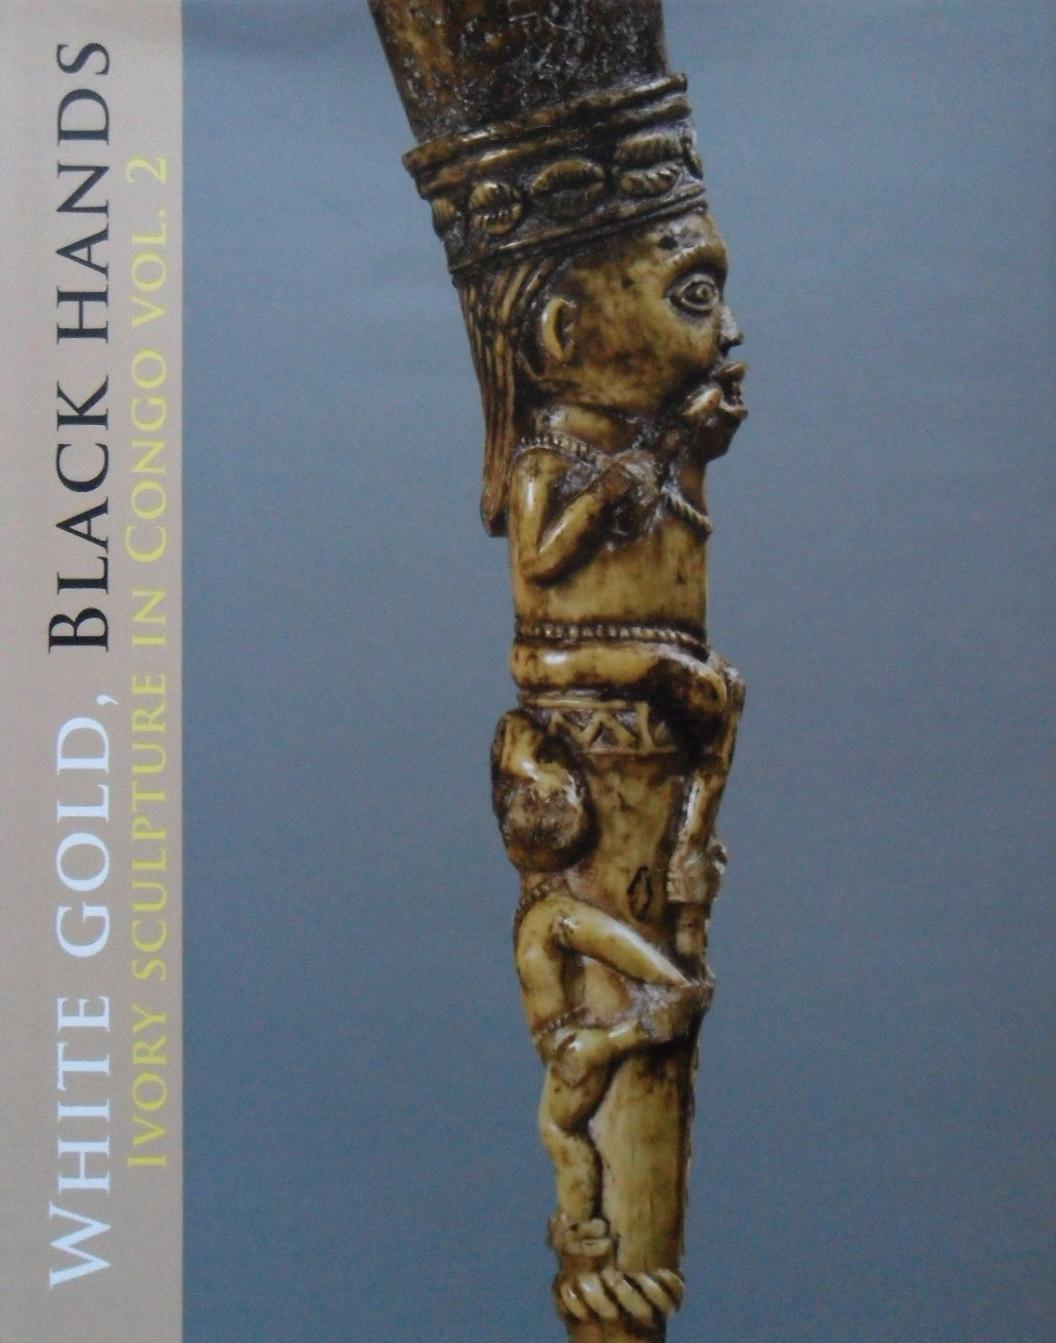 WHITE GOLD, BLACK HANDS. Ivory Sculpture in Congo Vol. 2: Marc Leo Felix (ed.)